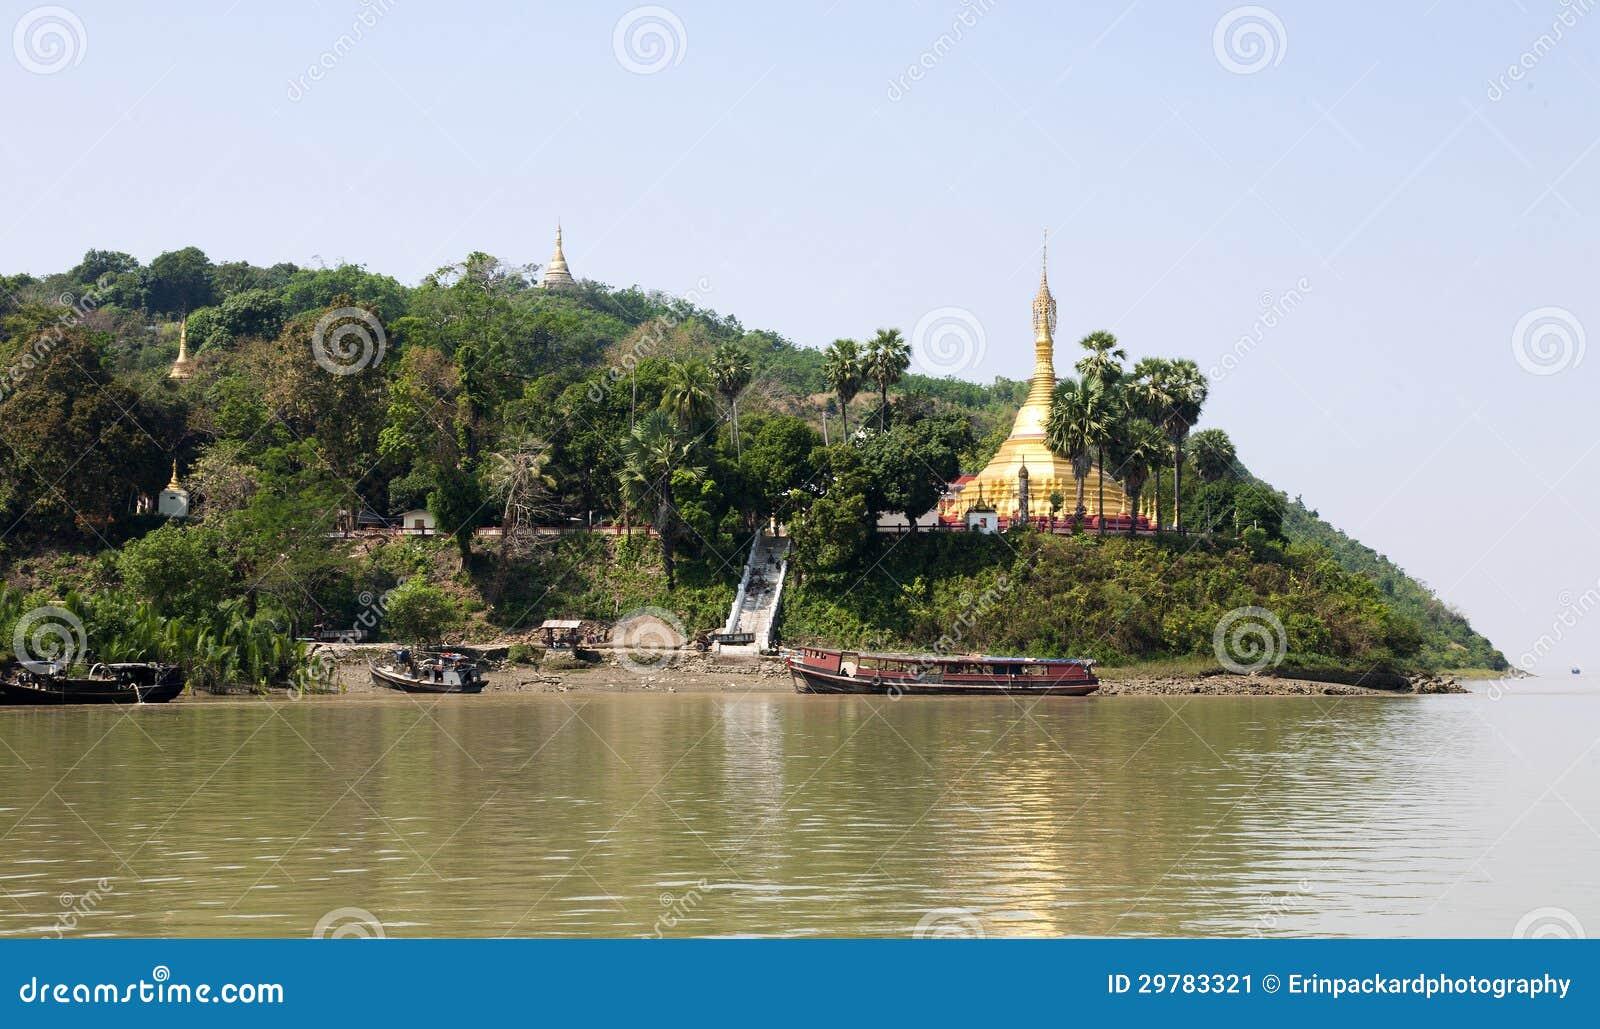 Mawlamyine Myanmar  city photo : ... pagoda on the edge of Ogre Island near Mawlamyine in southern Myanmar